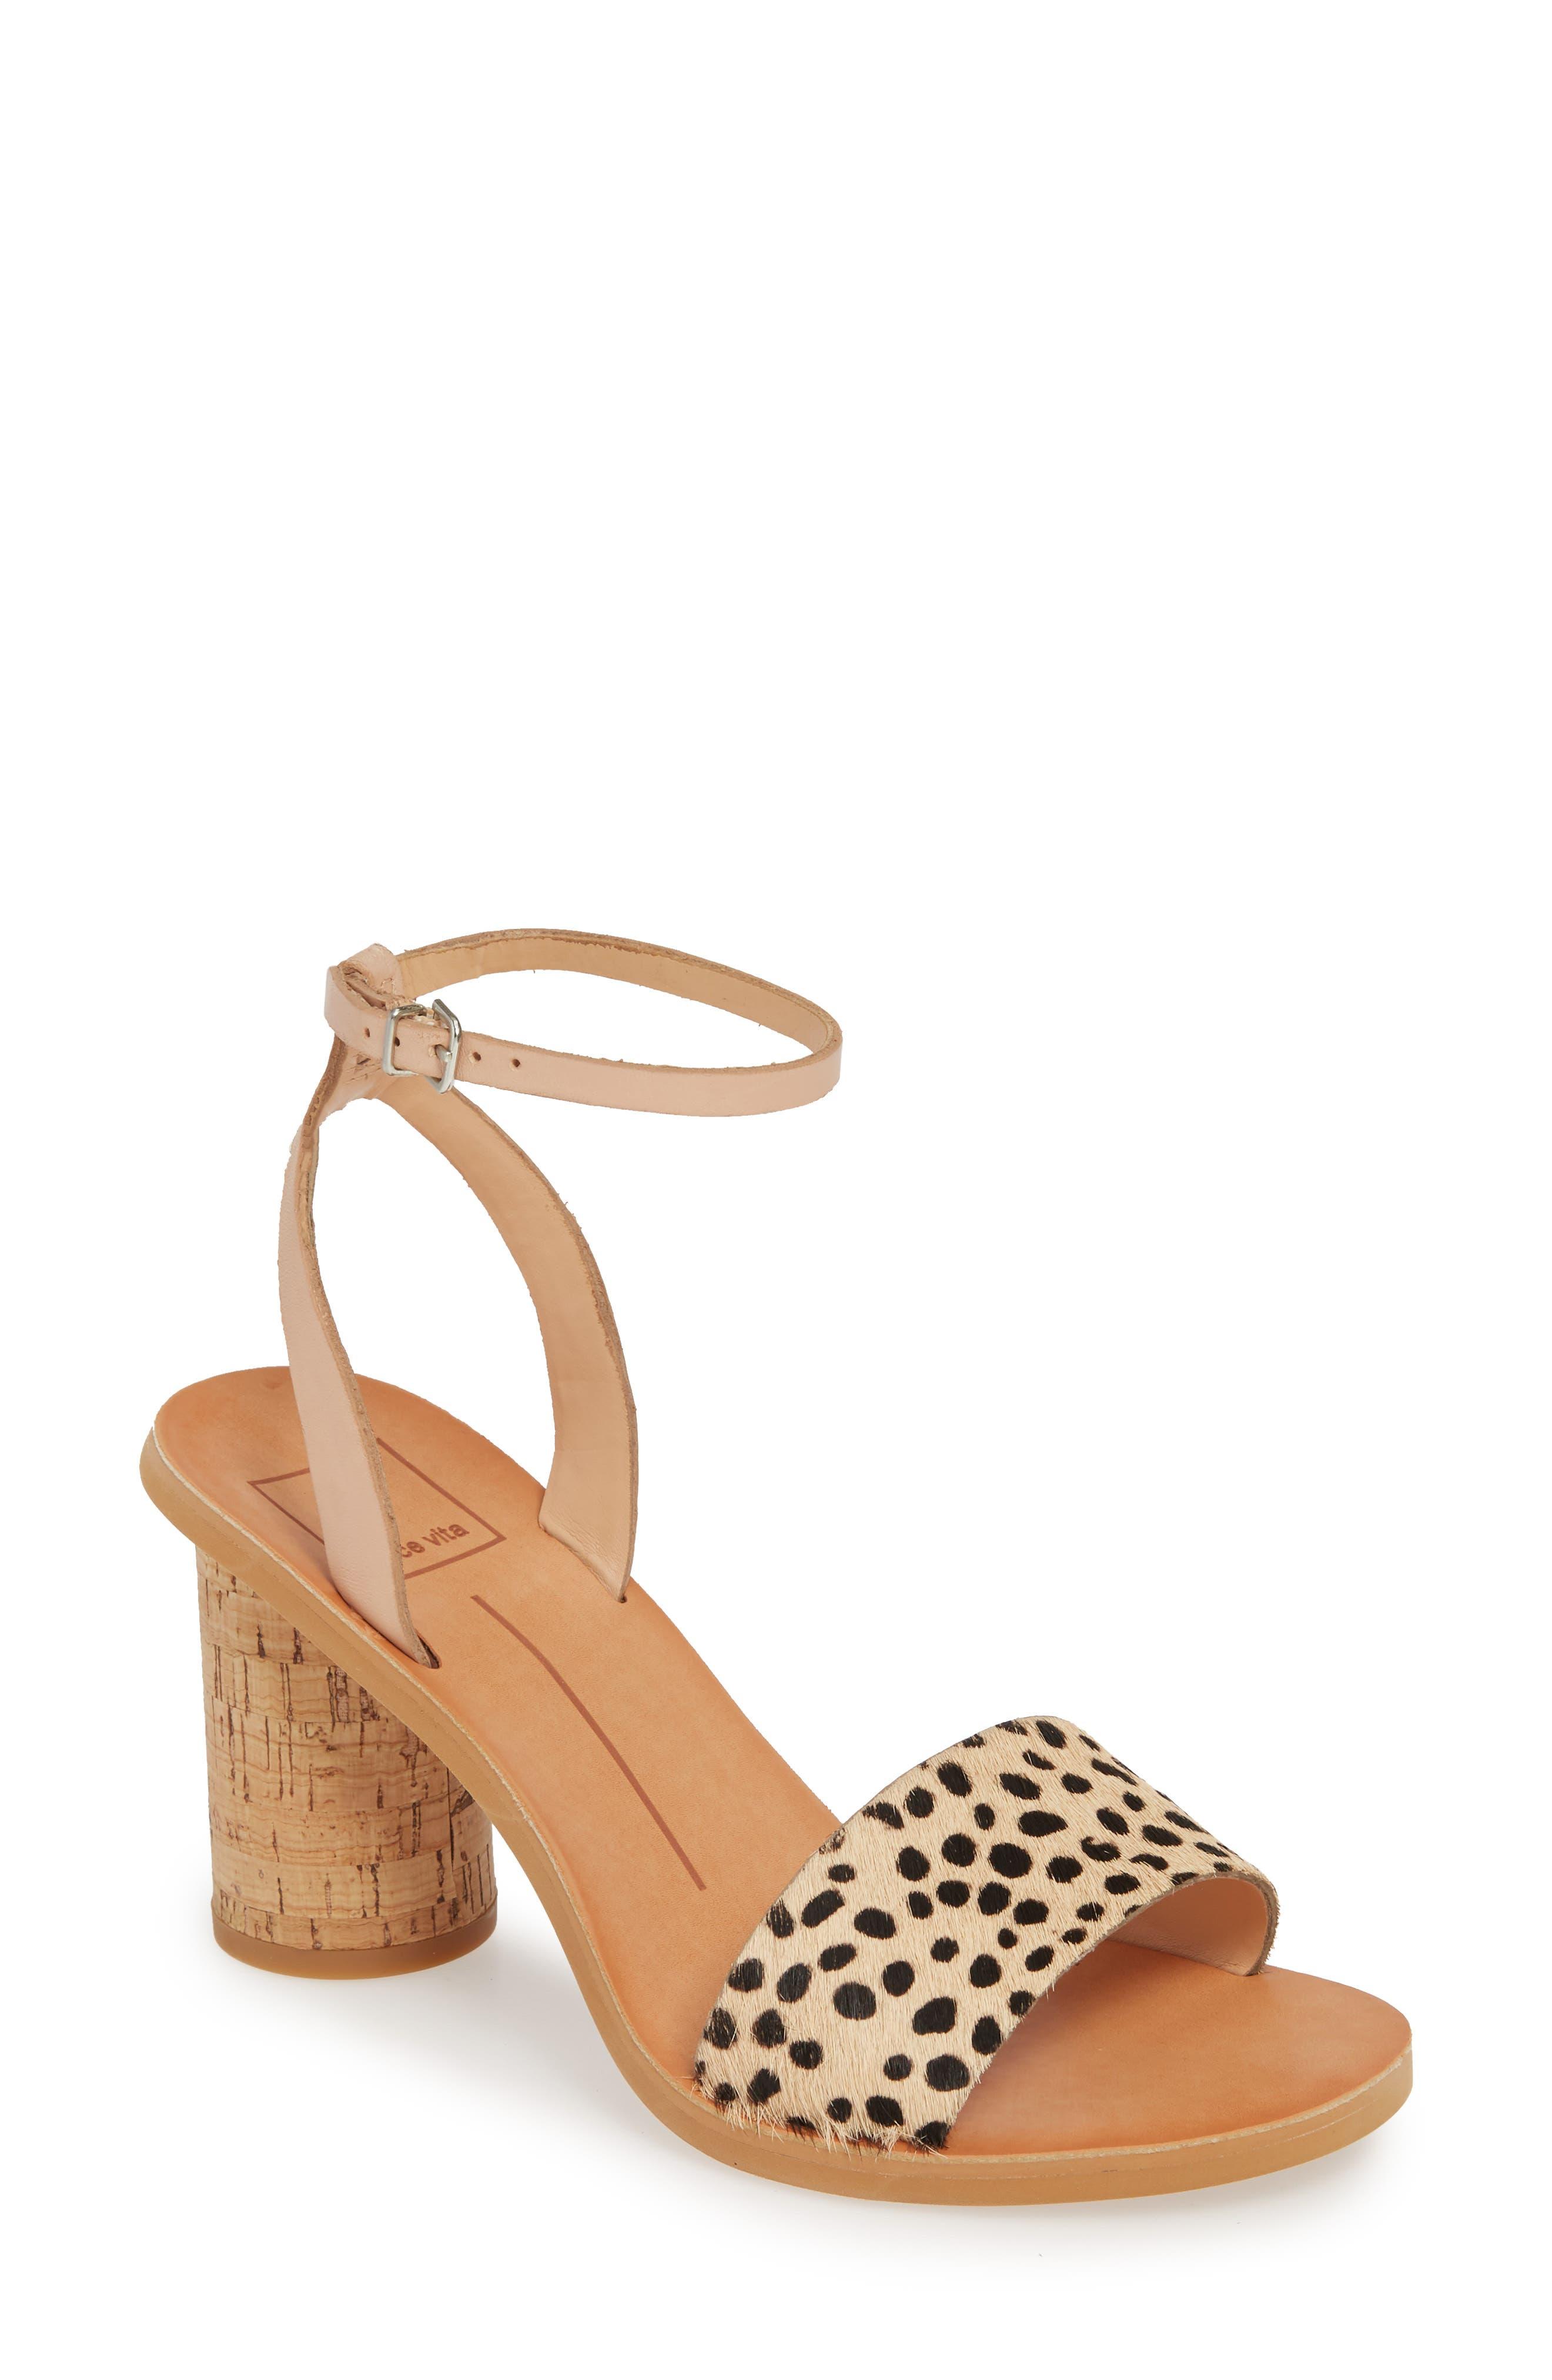 DOLCE VITA Jali Column Heel Sandal, Main, color, LEOPARD PRINT